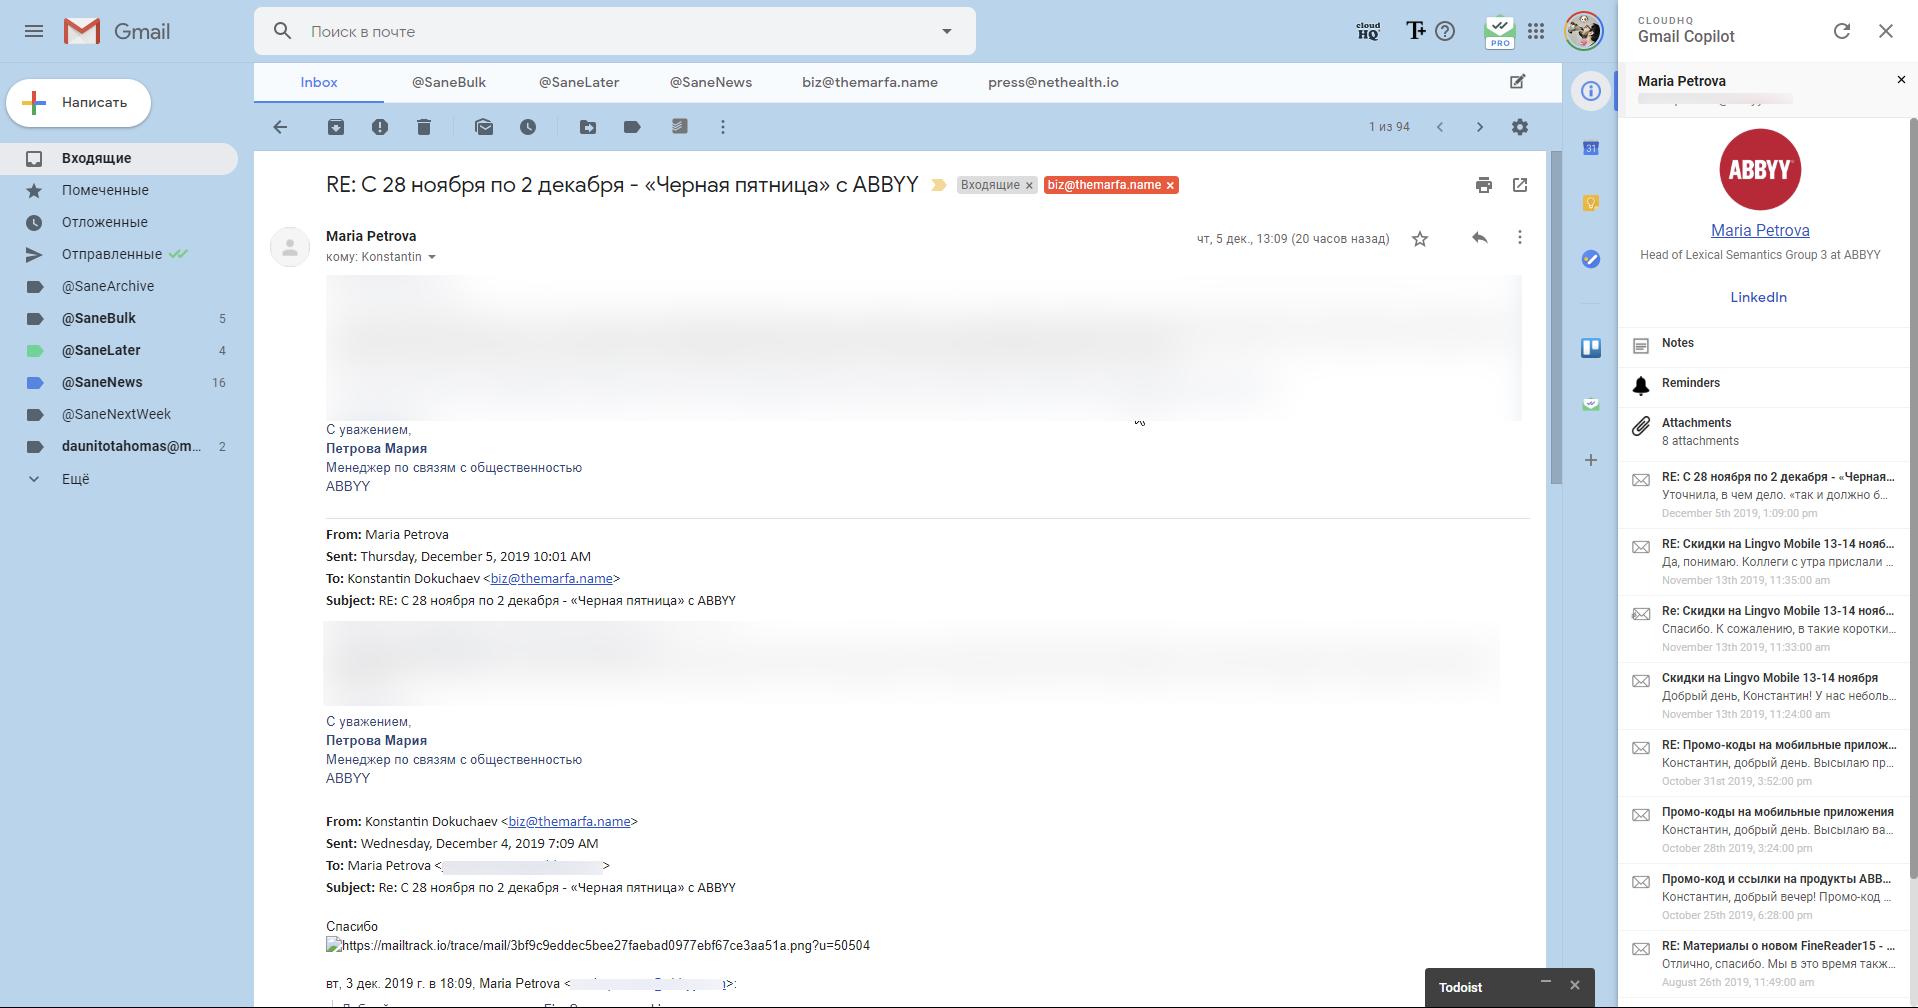 Gmail Copilot